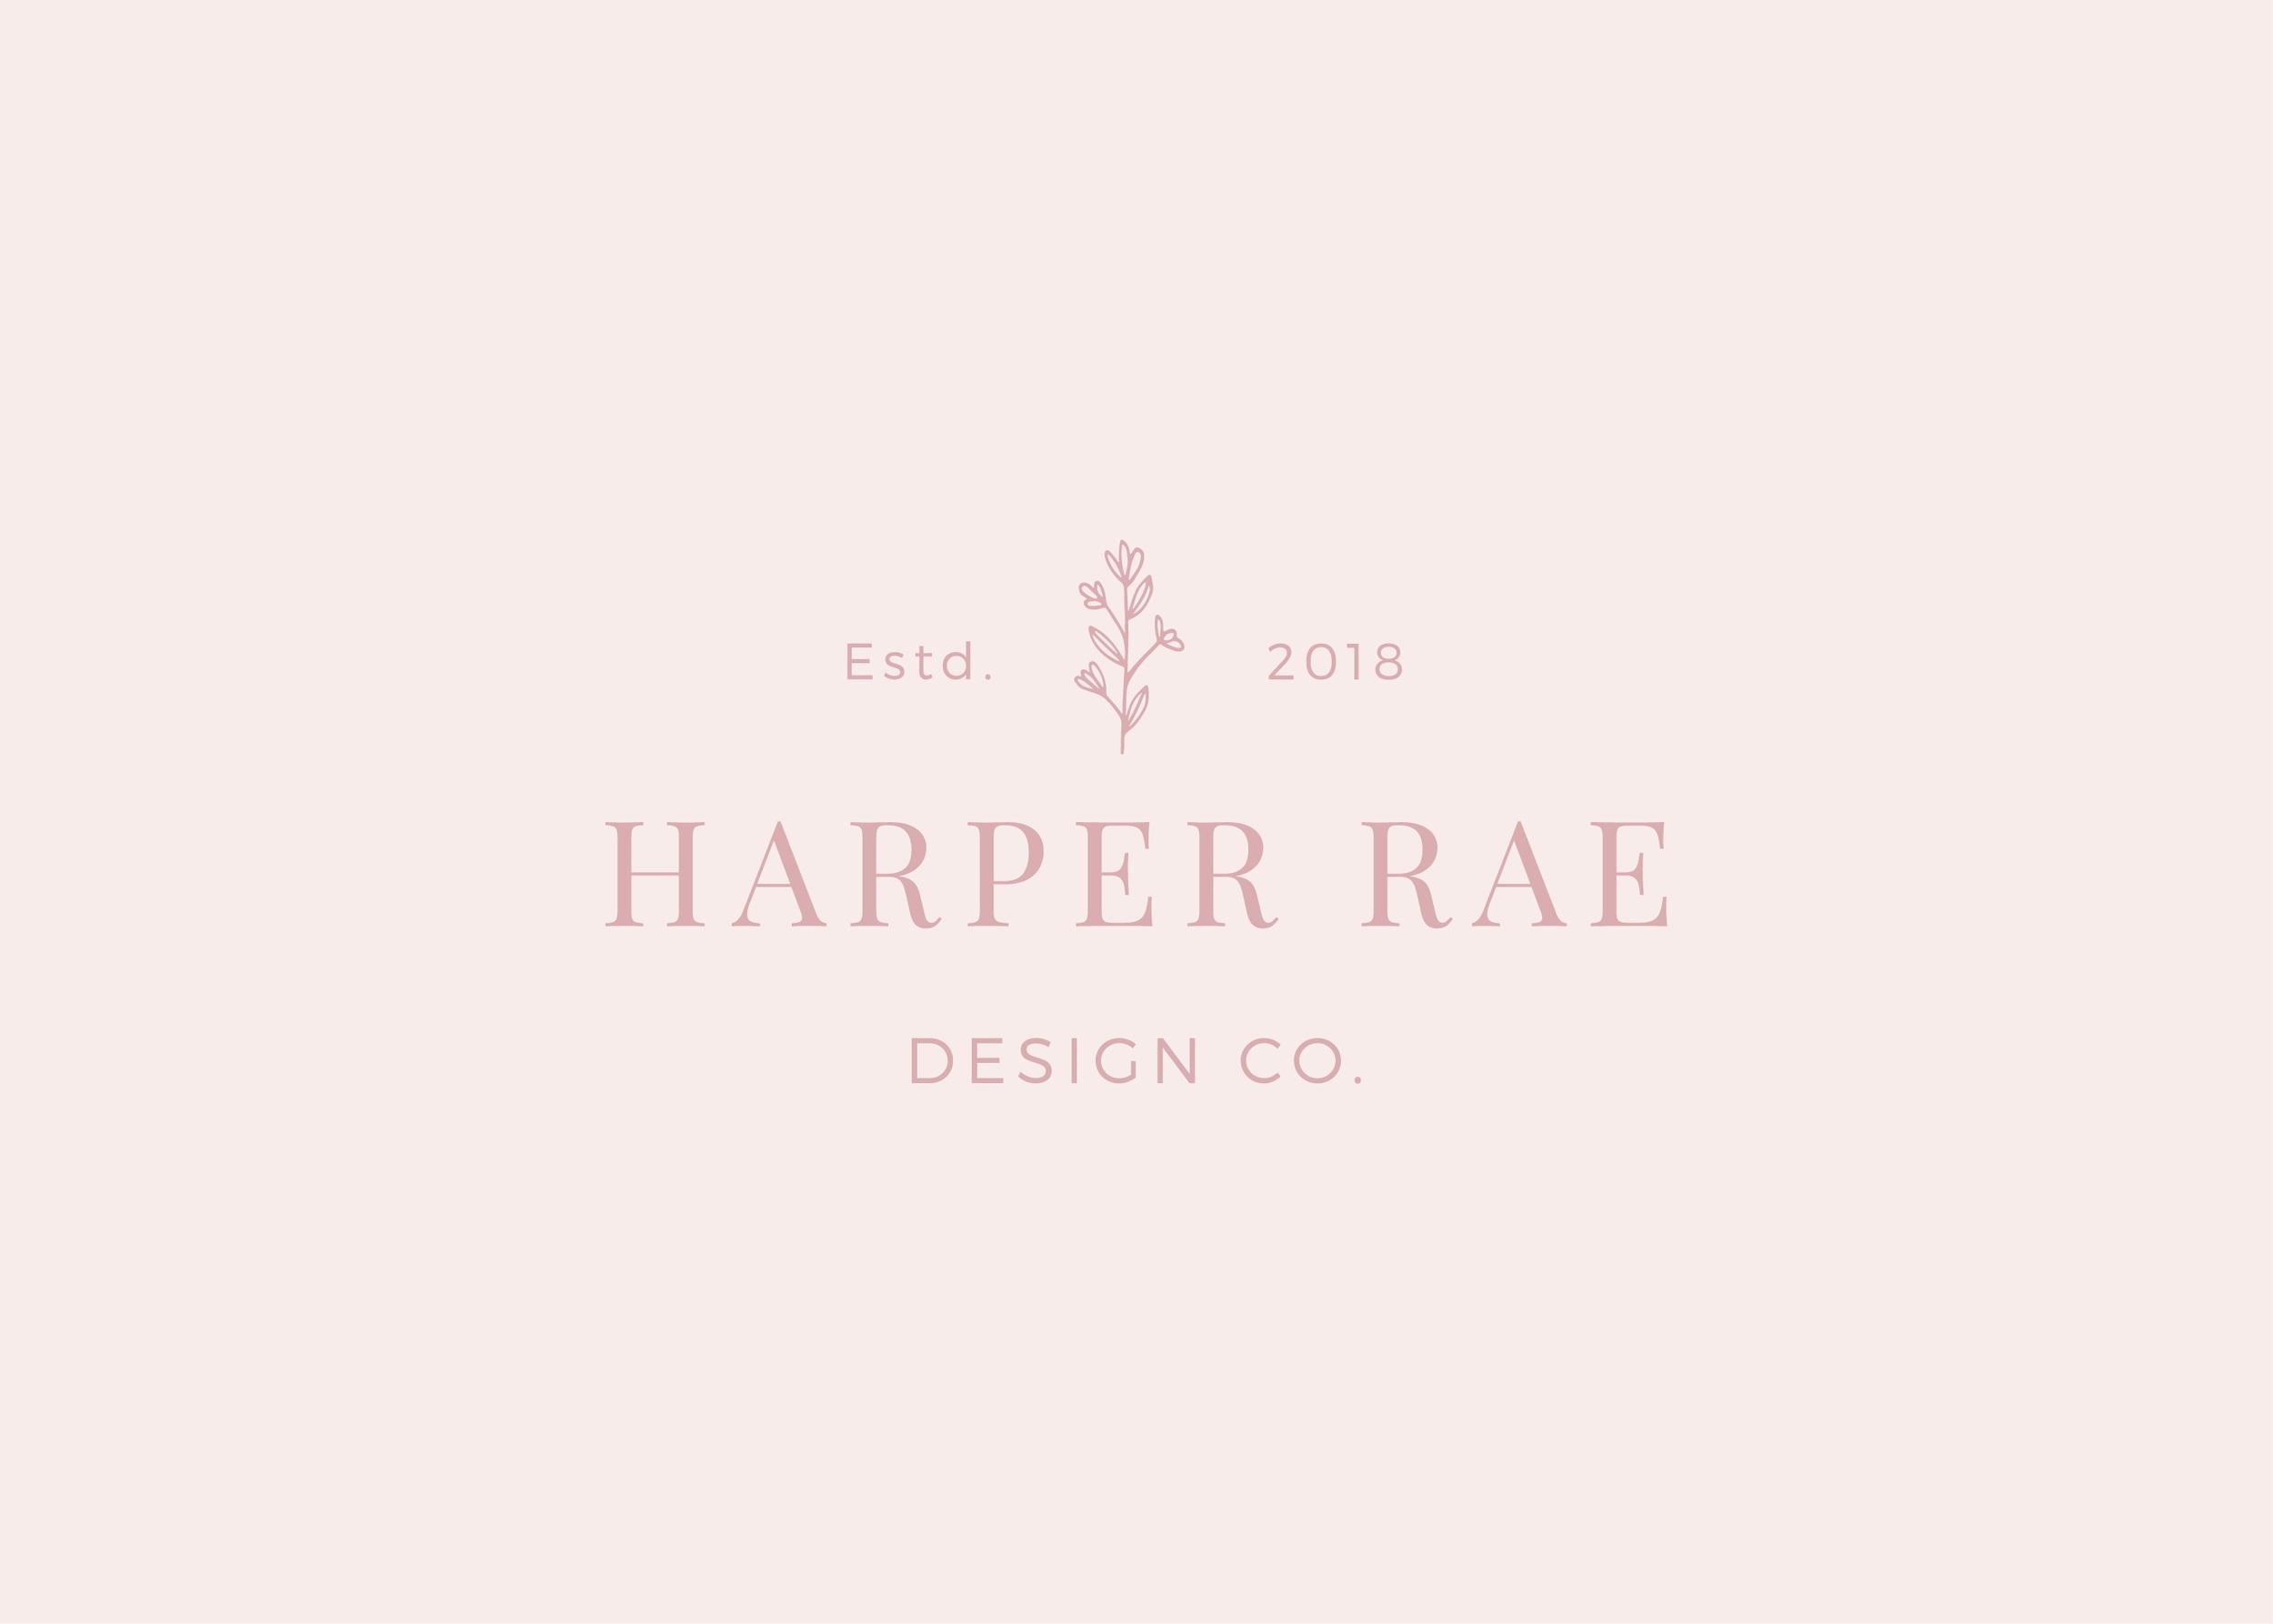 HARPER RAE DESIGN CO.